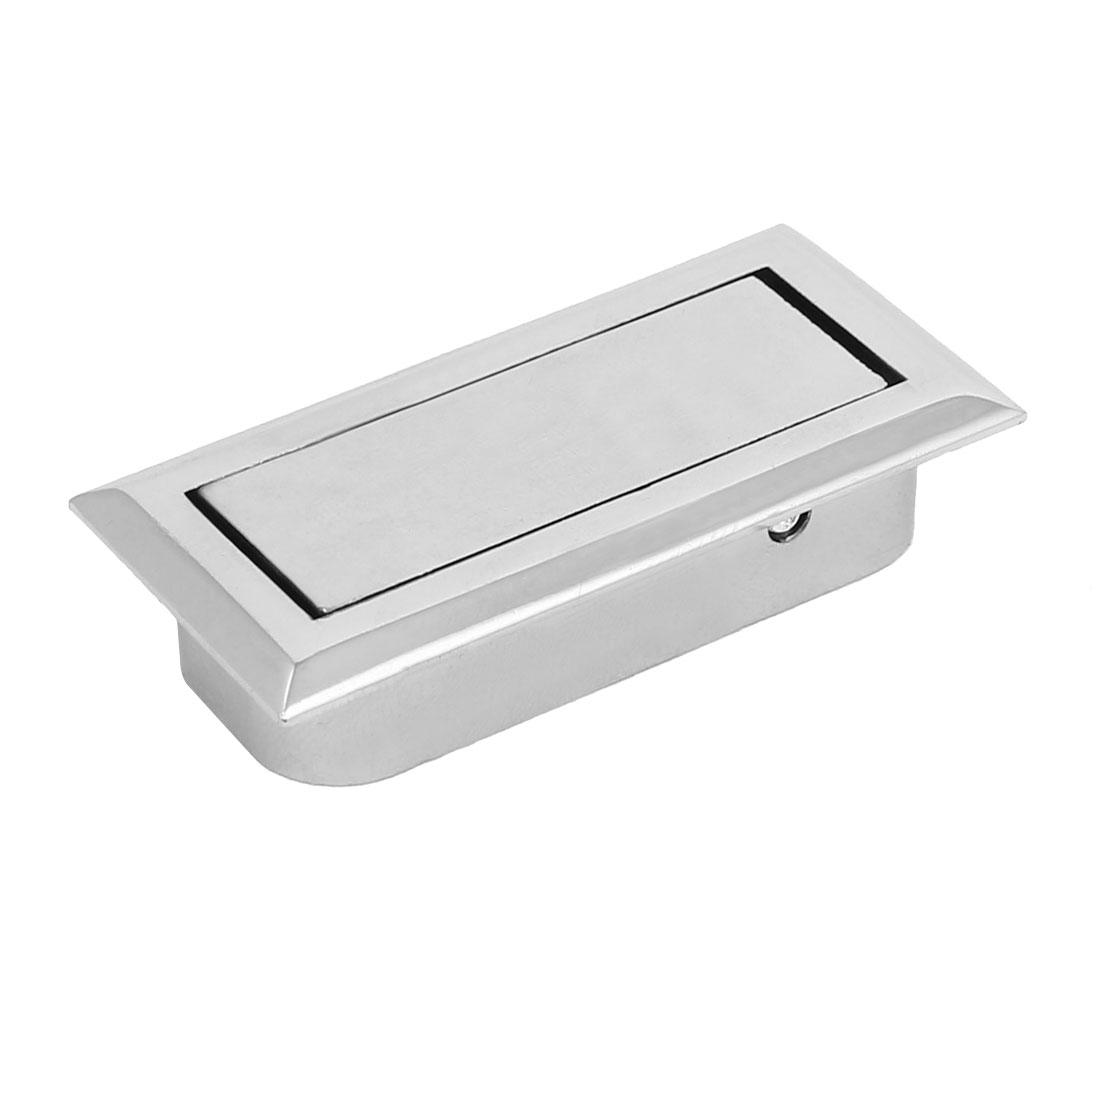 Home Office Drawer Dresser Metal Hidden Pull Handle Grip Silver Tone